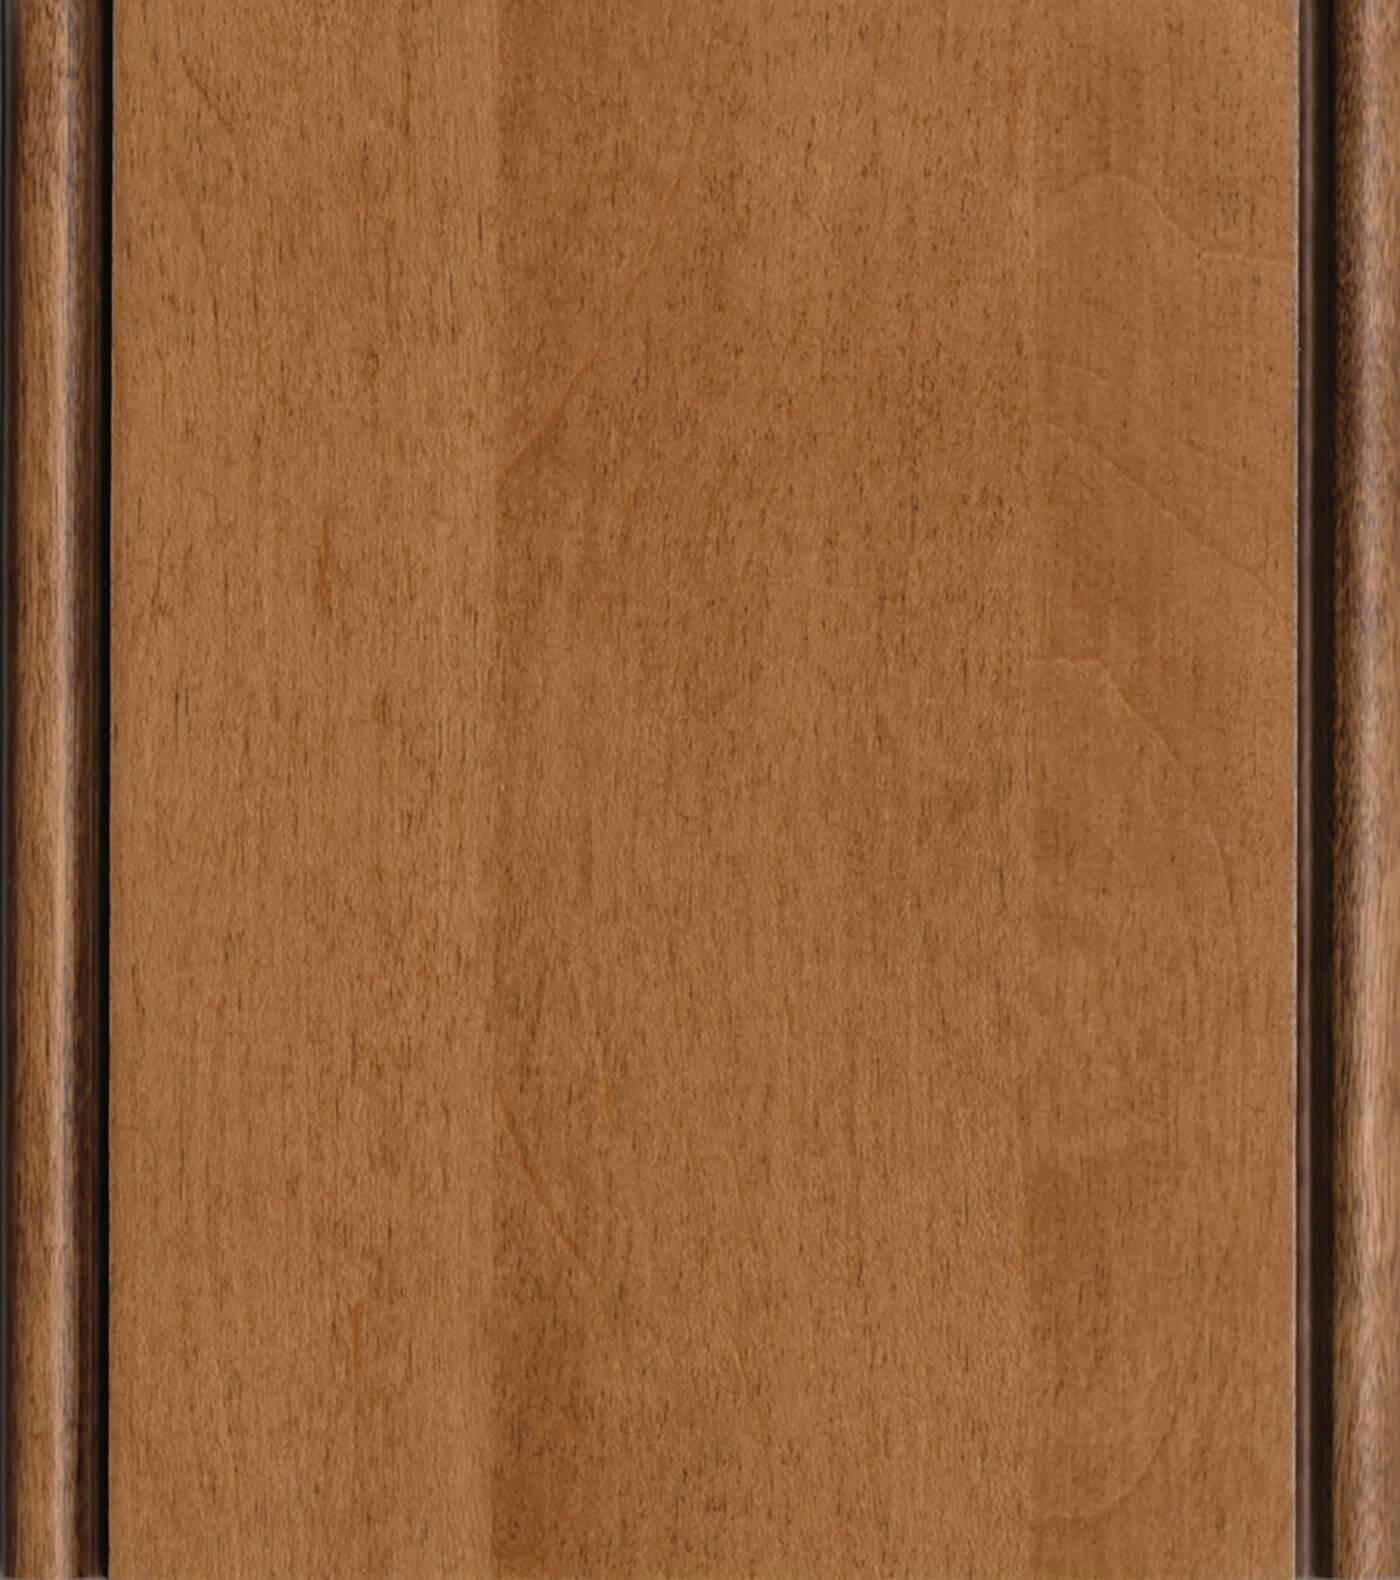 Clove / Black Accent Stain/Glaze on Maple